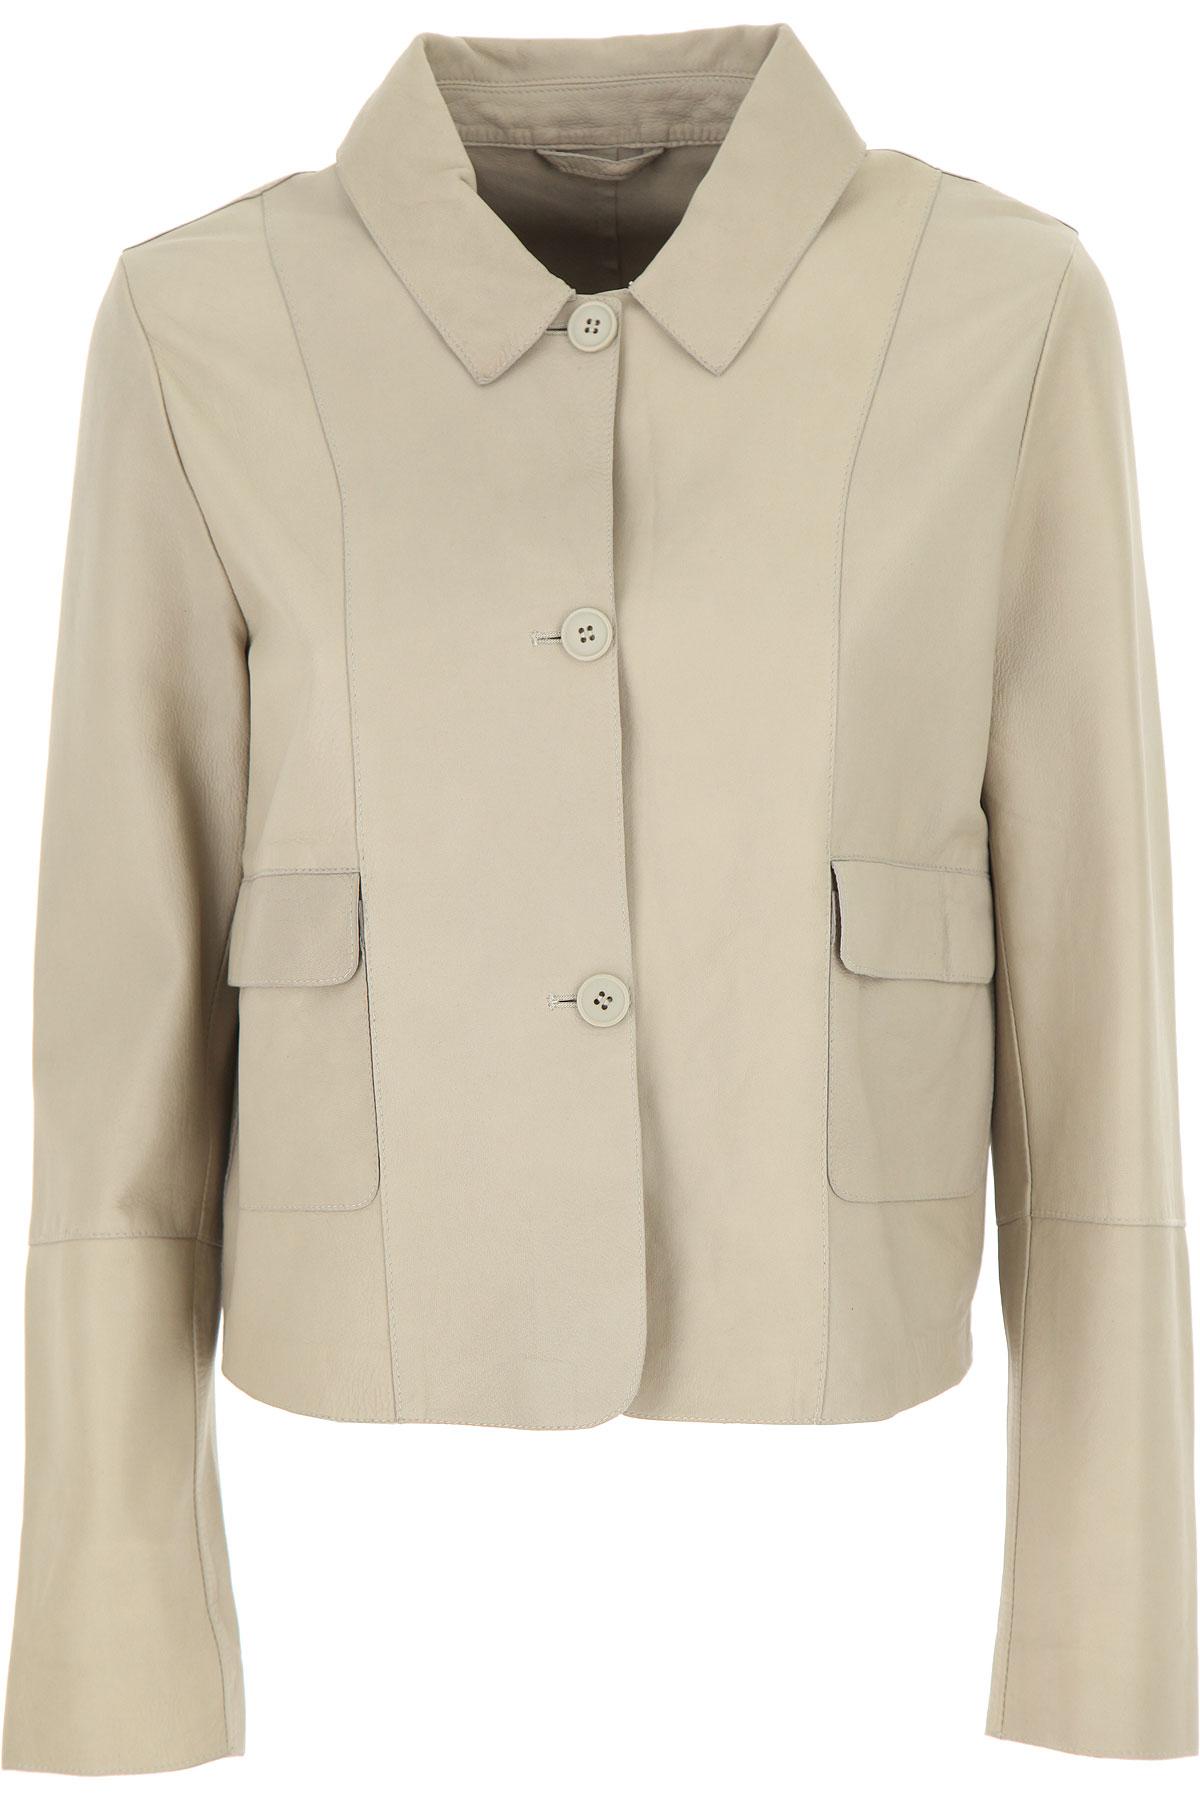 S.W.O.R.D Leather Jacket for Women On Sale, Chalk, Leather, 2019, FR 42 - IT 46 FR 44 - IT 48